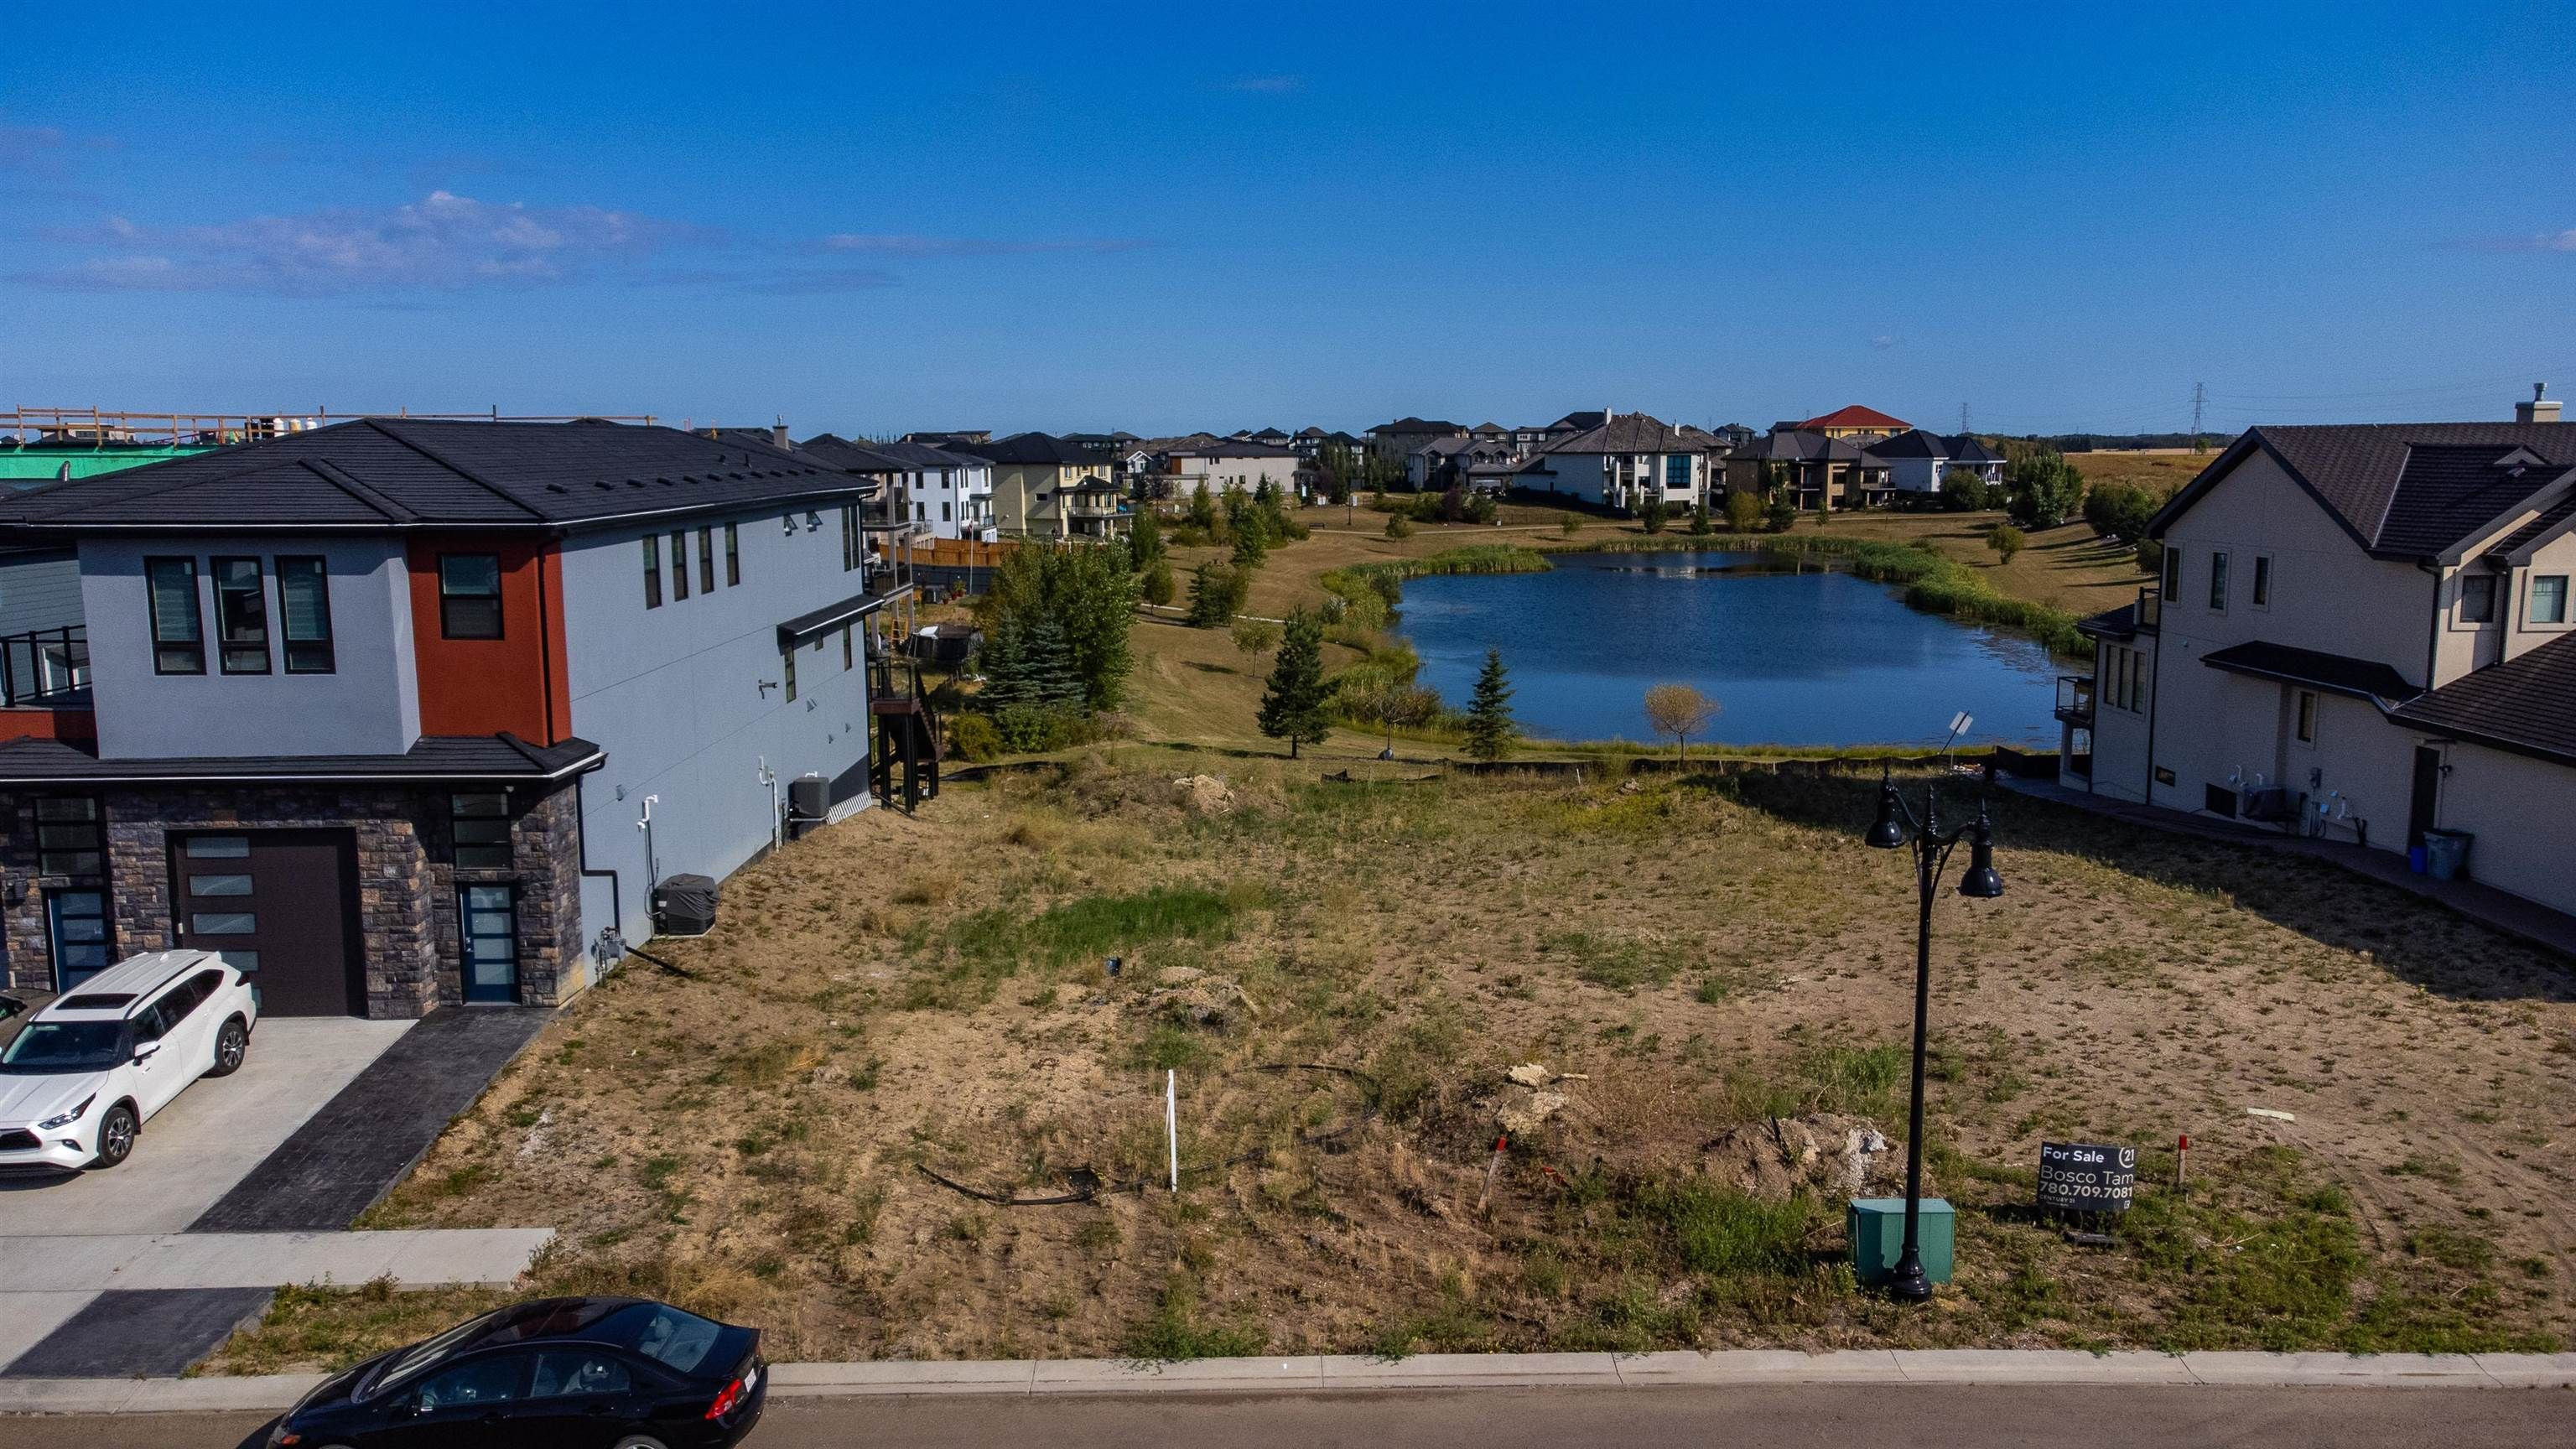 Main Photo: 3028 64 Avenue: Rural Leduc County Rural Land/Vacant Lot for sale : MLS®# E4259866